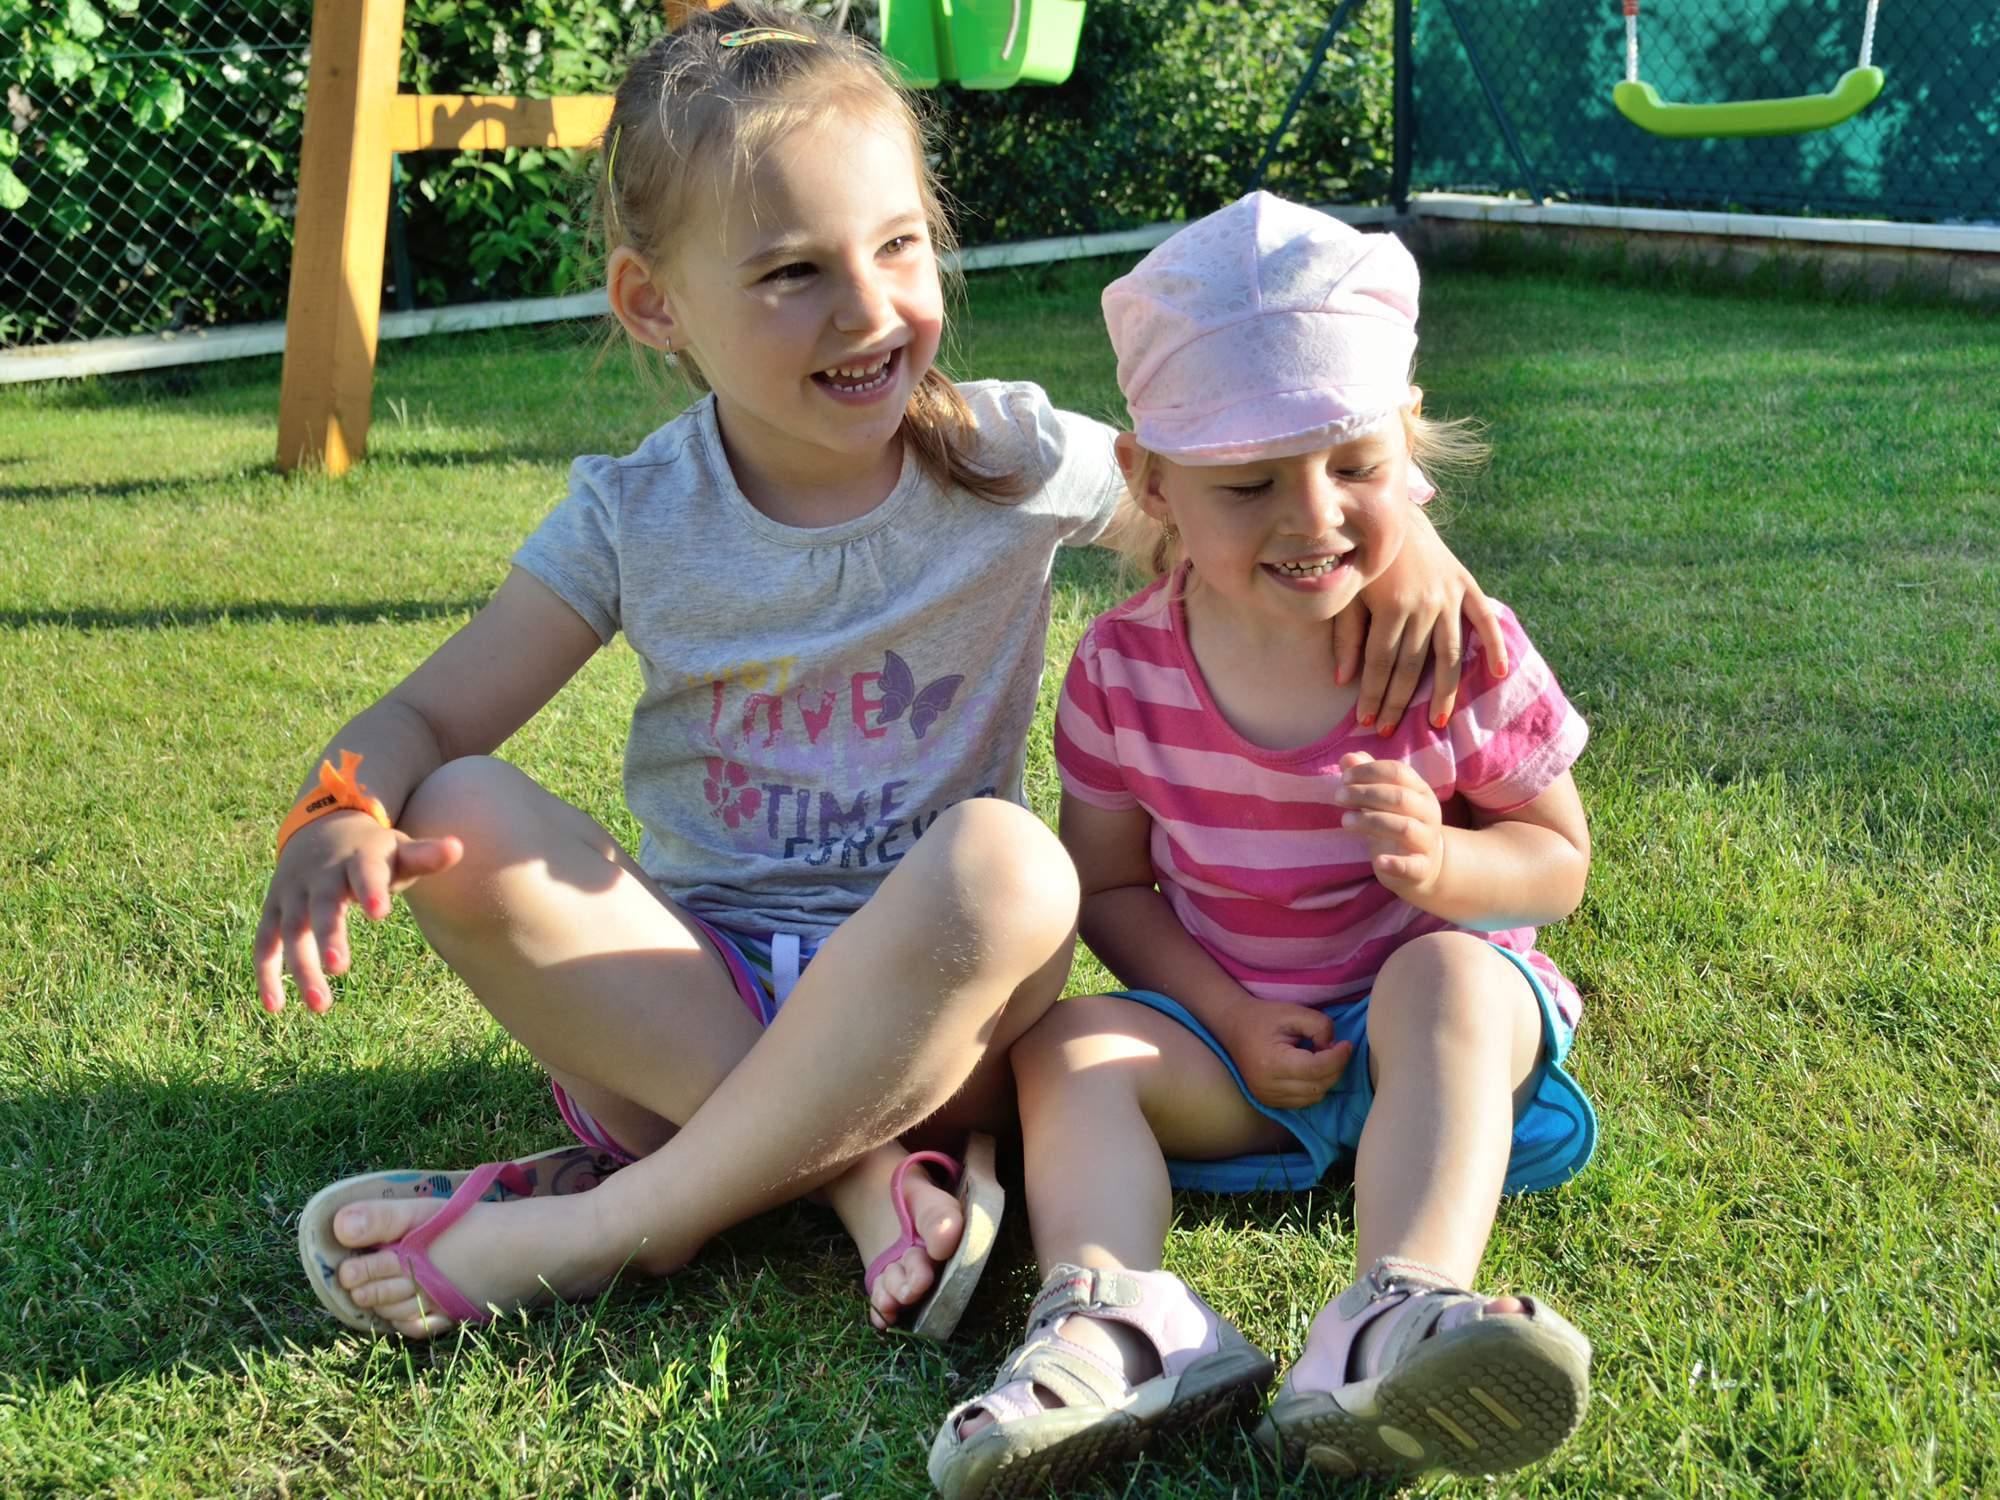 rajce.idnes.cz naked.1imgsrc.ru children girl